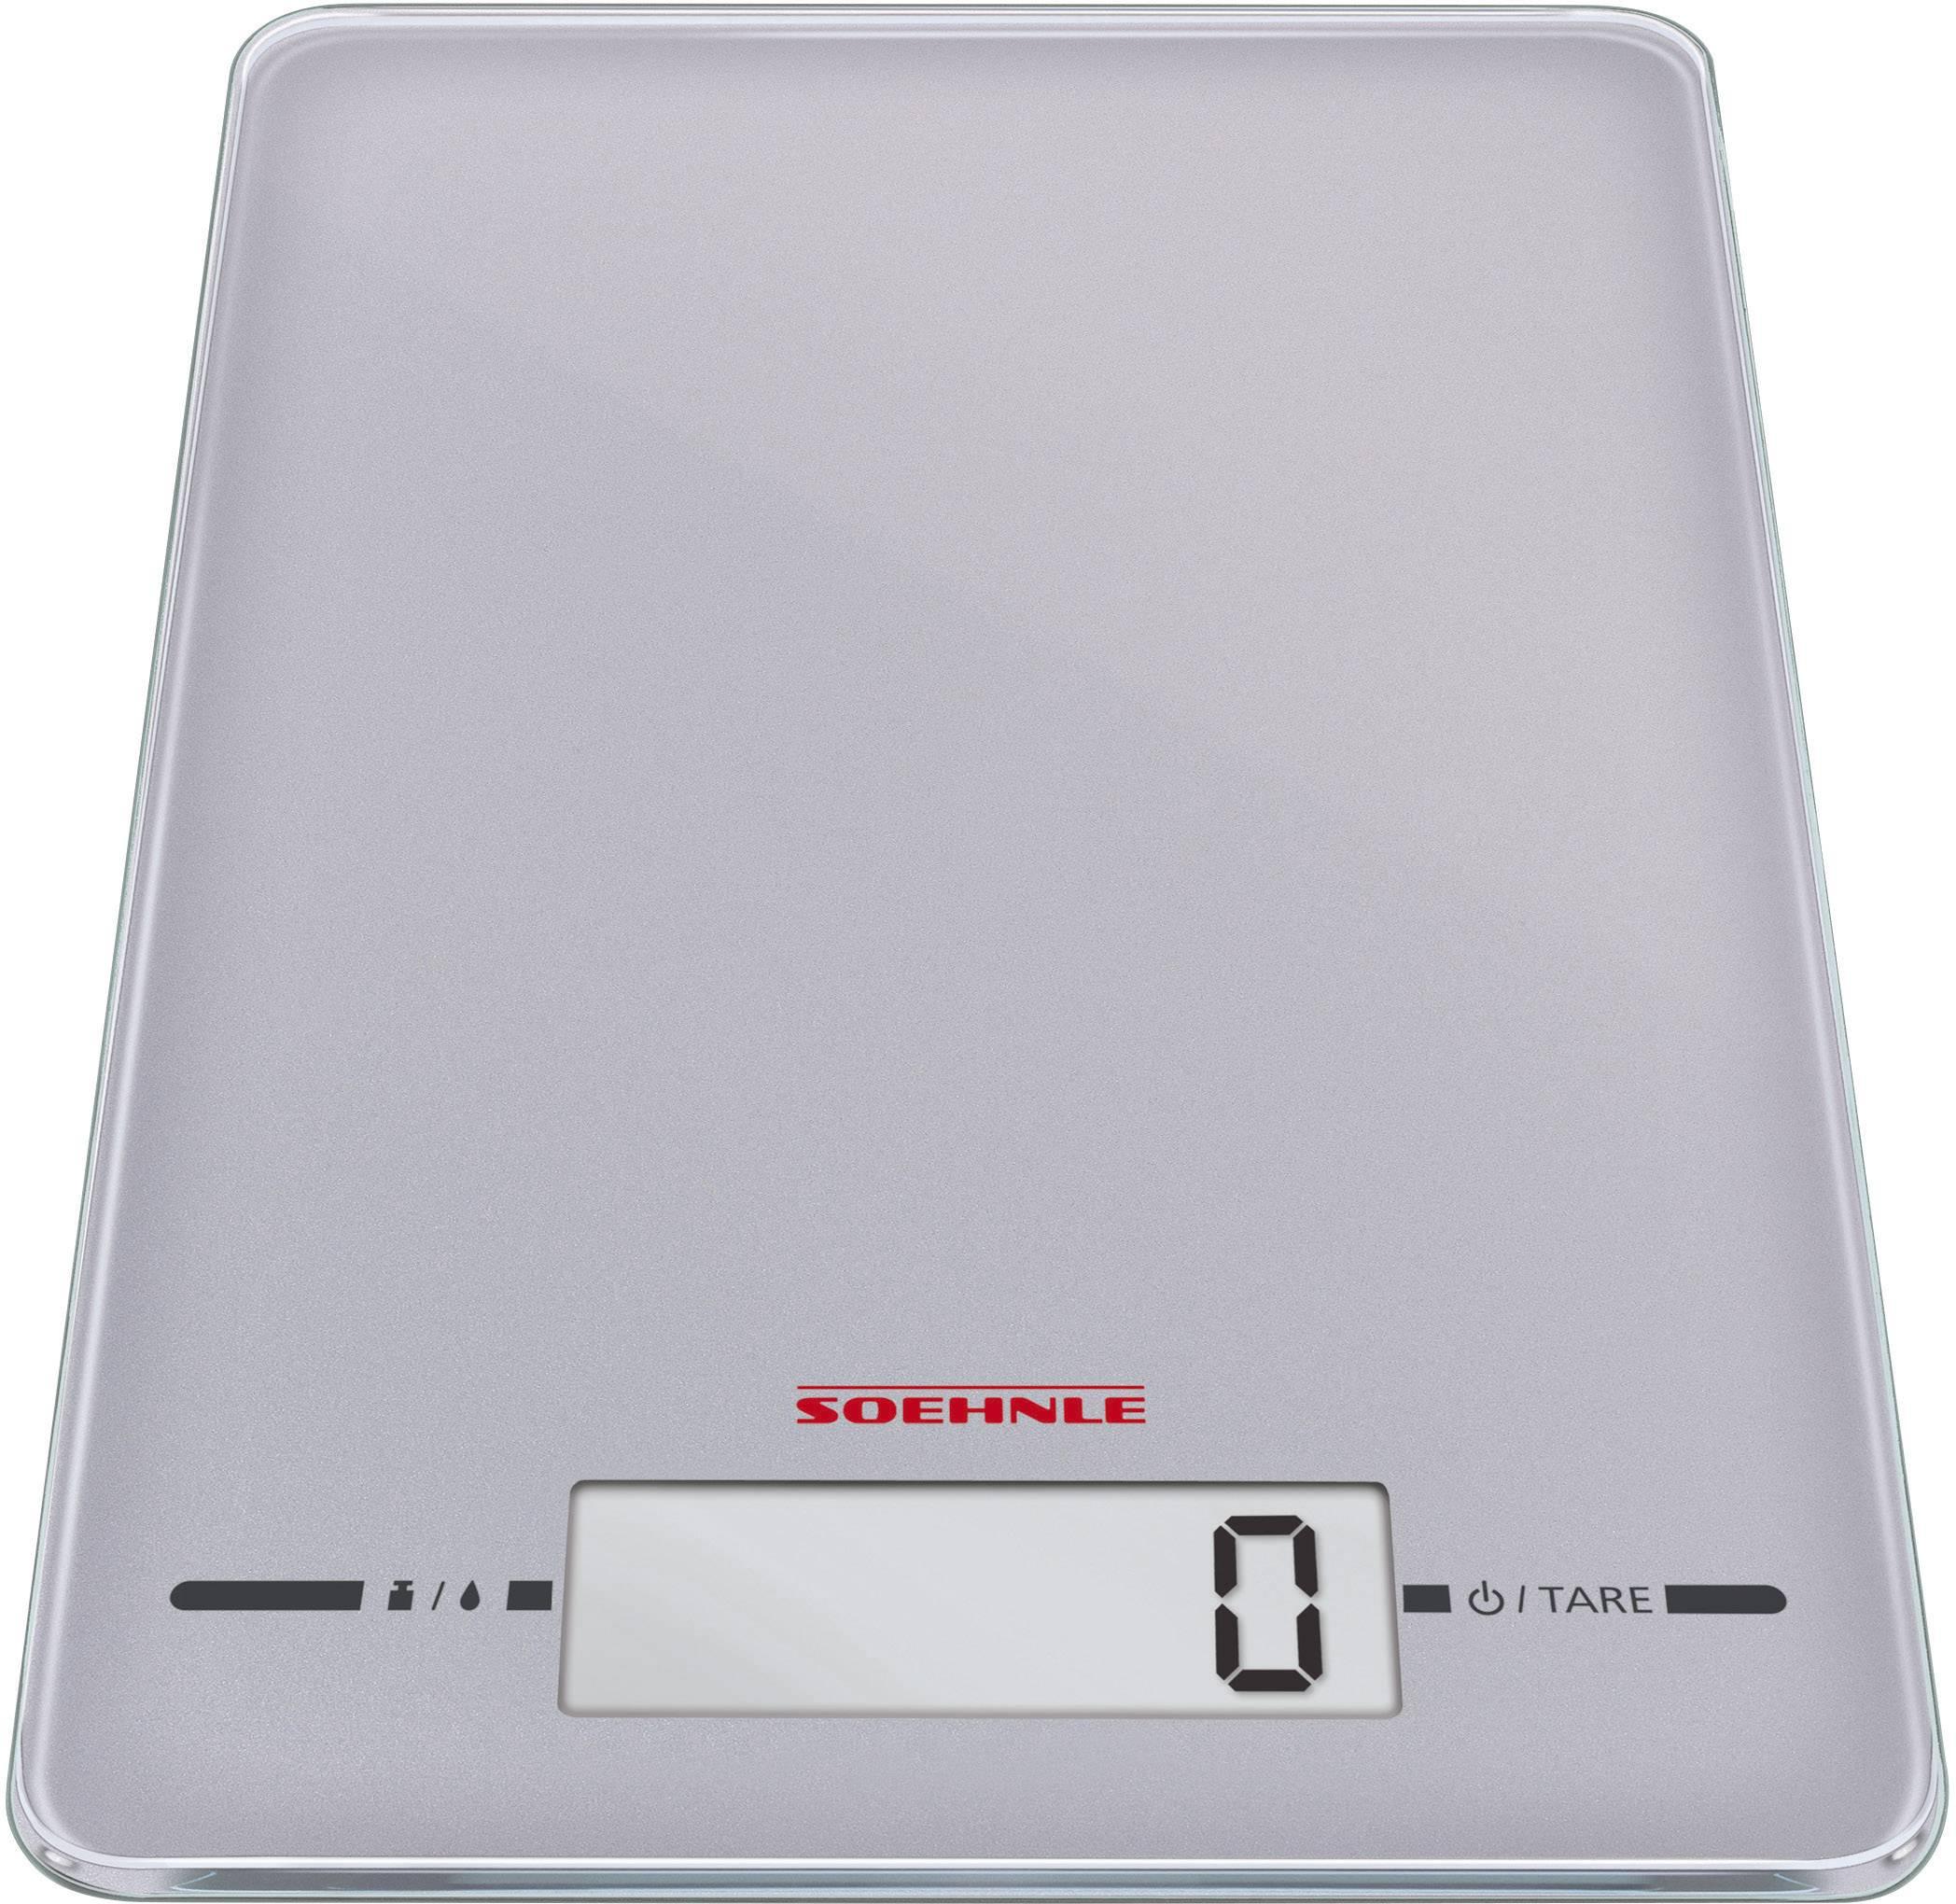 Digitálna kuchynská váha Soehnle Page Evolution silver, strieborná